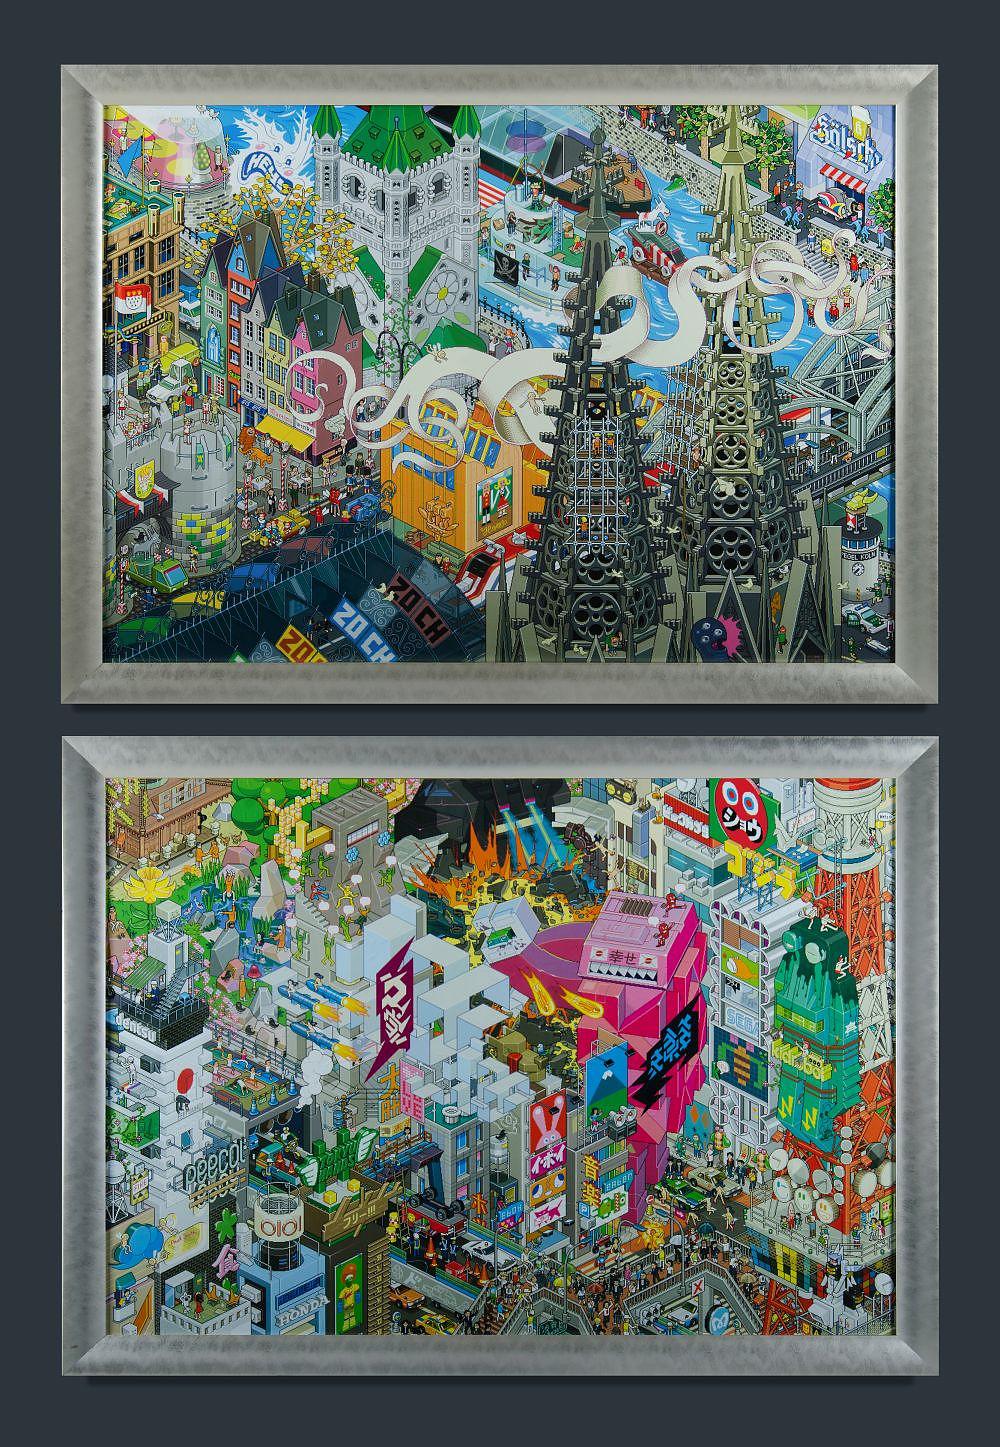 "'eBoy, Tokyo & Barcelona"""" Digital Print (2)'"